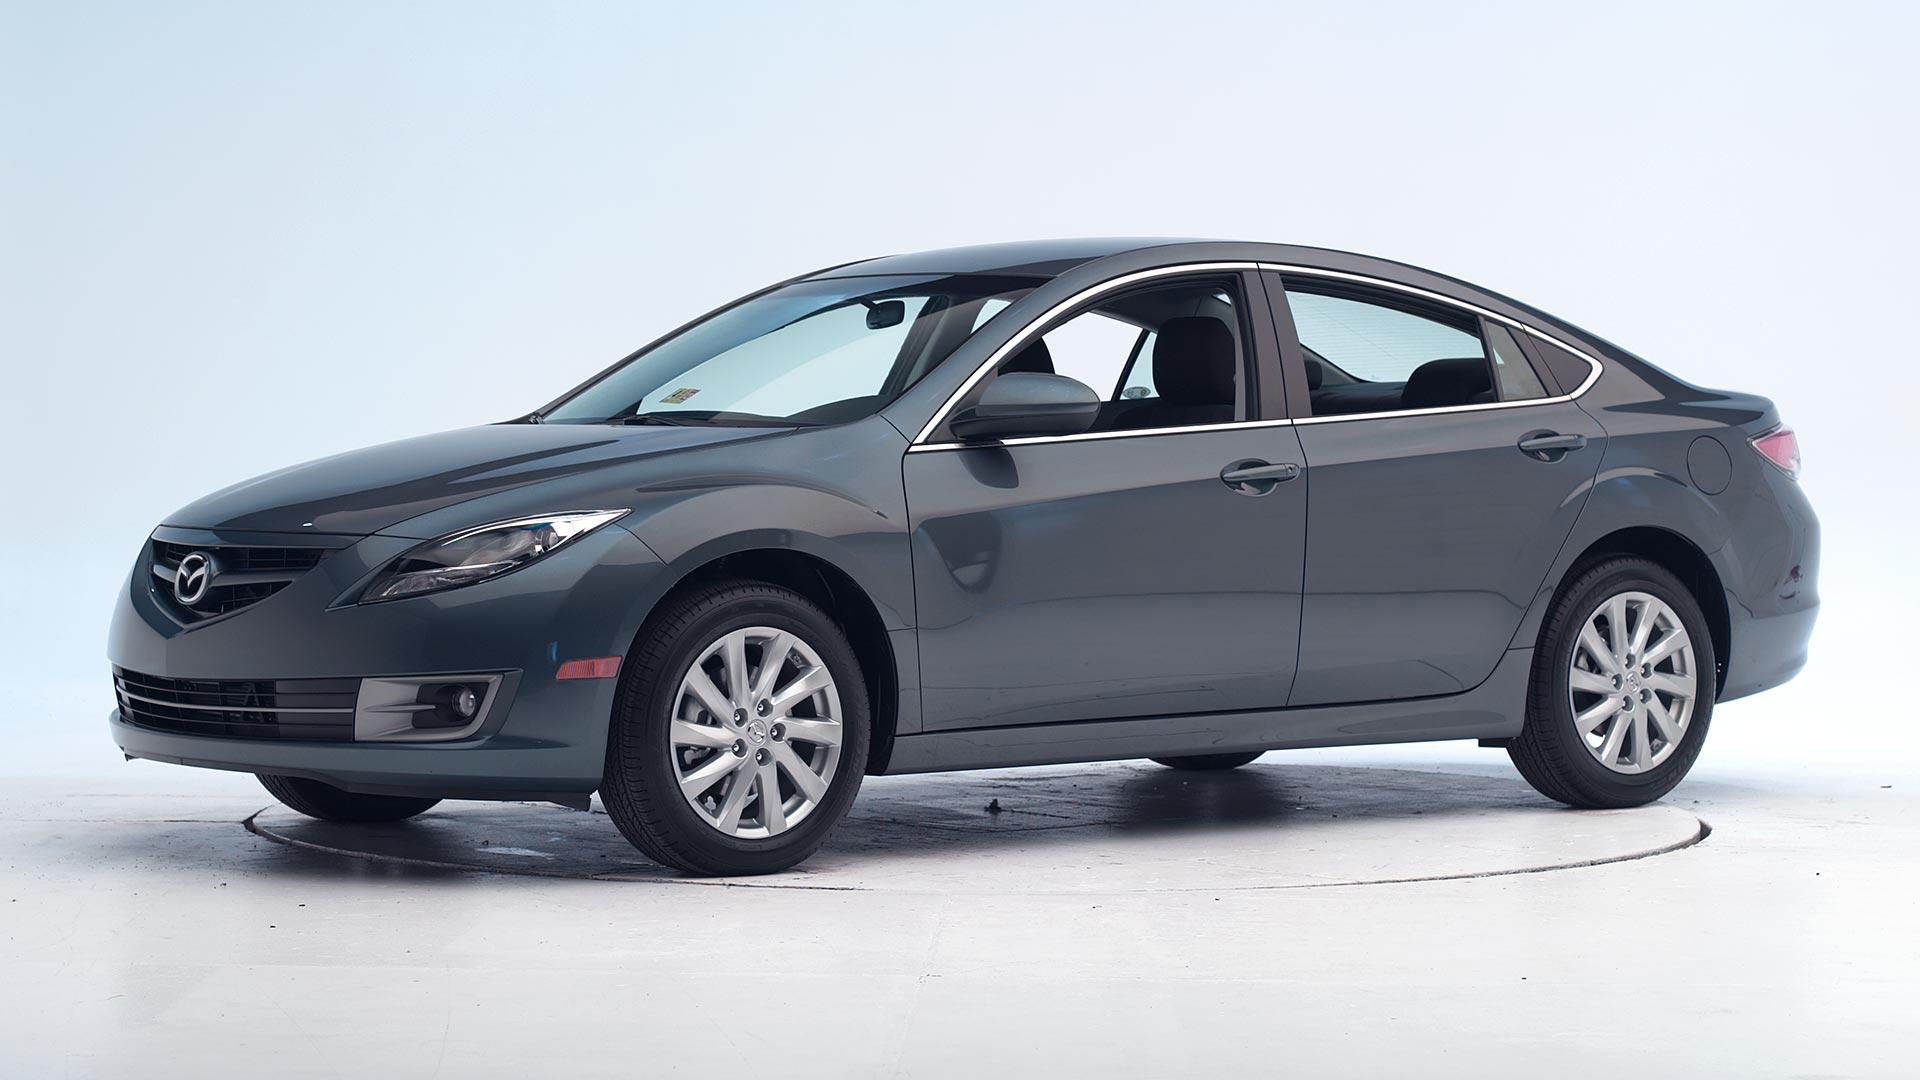 Kelebihan Mazda 6 2012 Tangguh